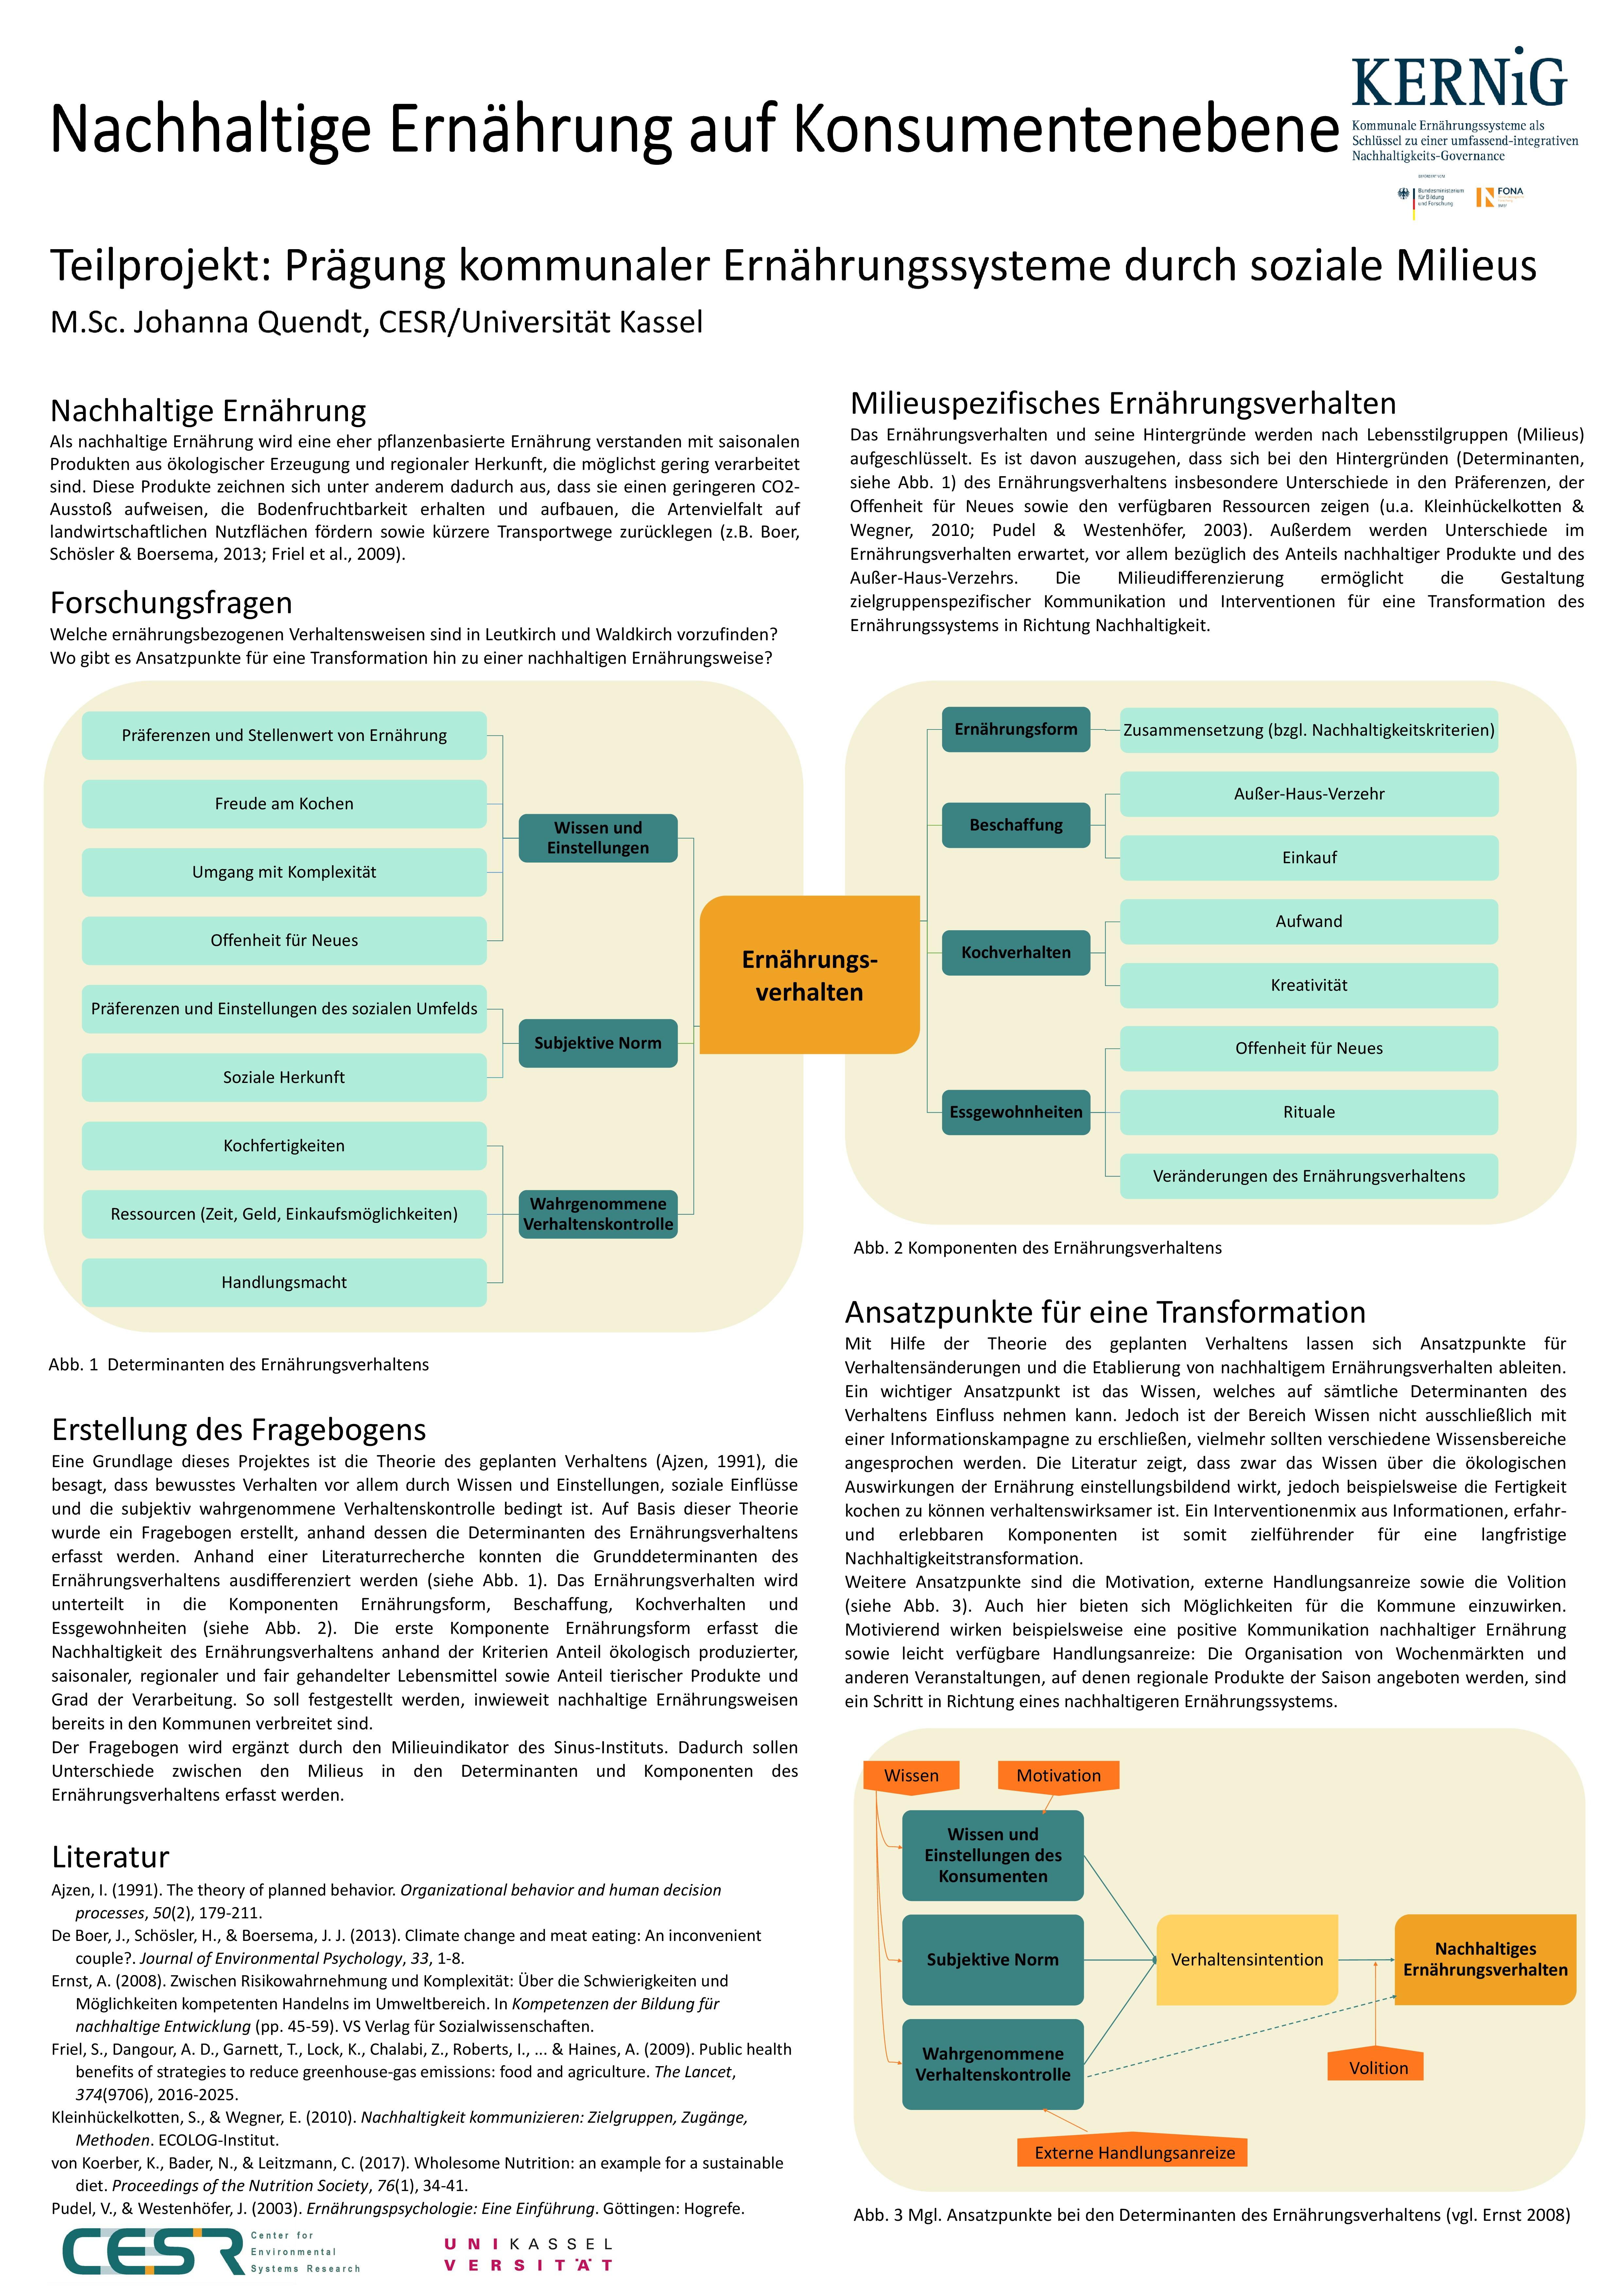 poster-soziale-milieus-bild.jpg — Sustainability and Environmental ...